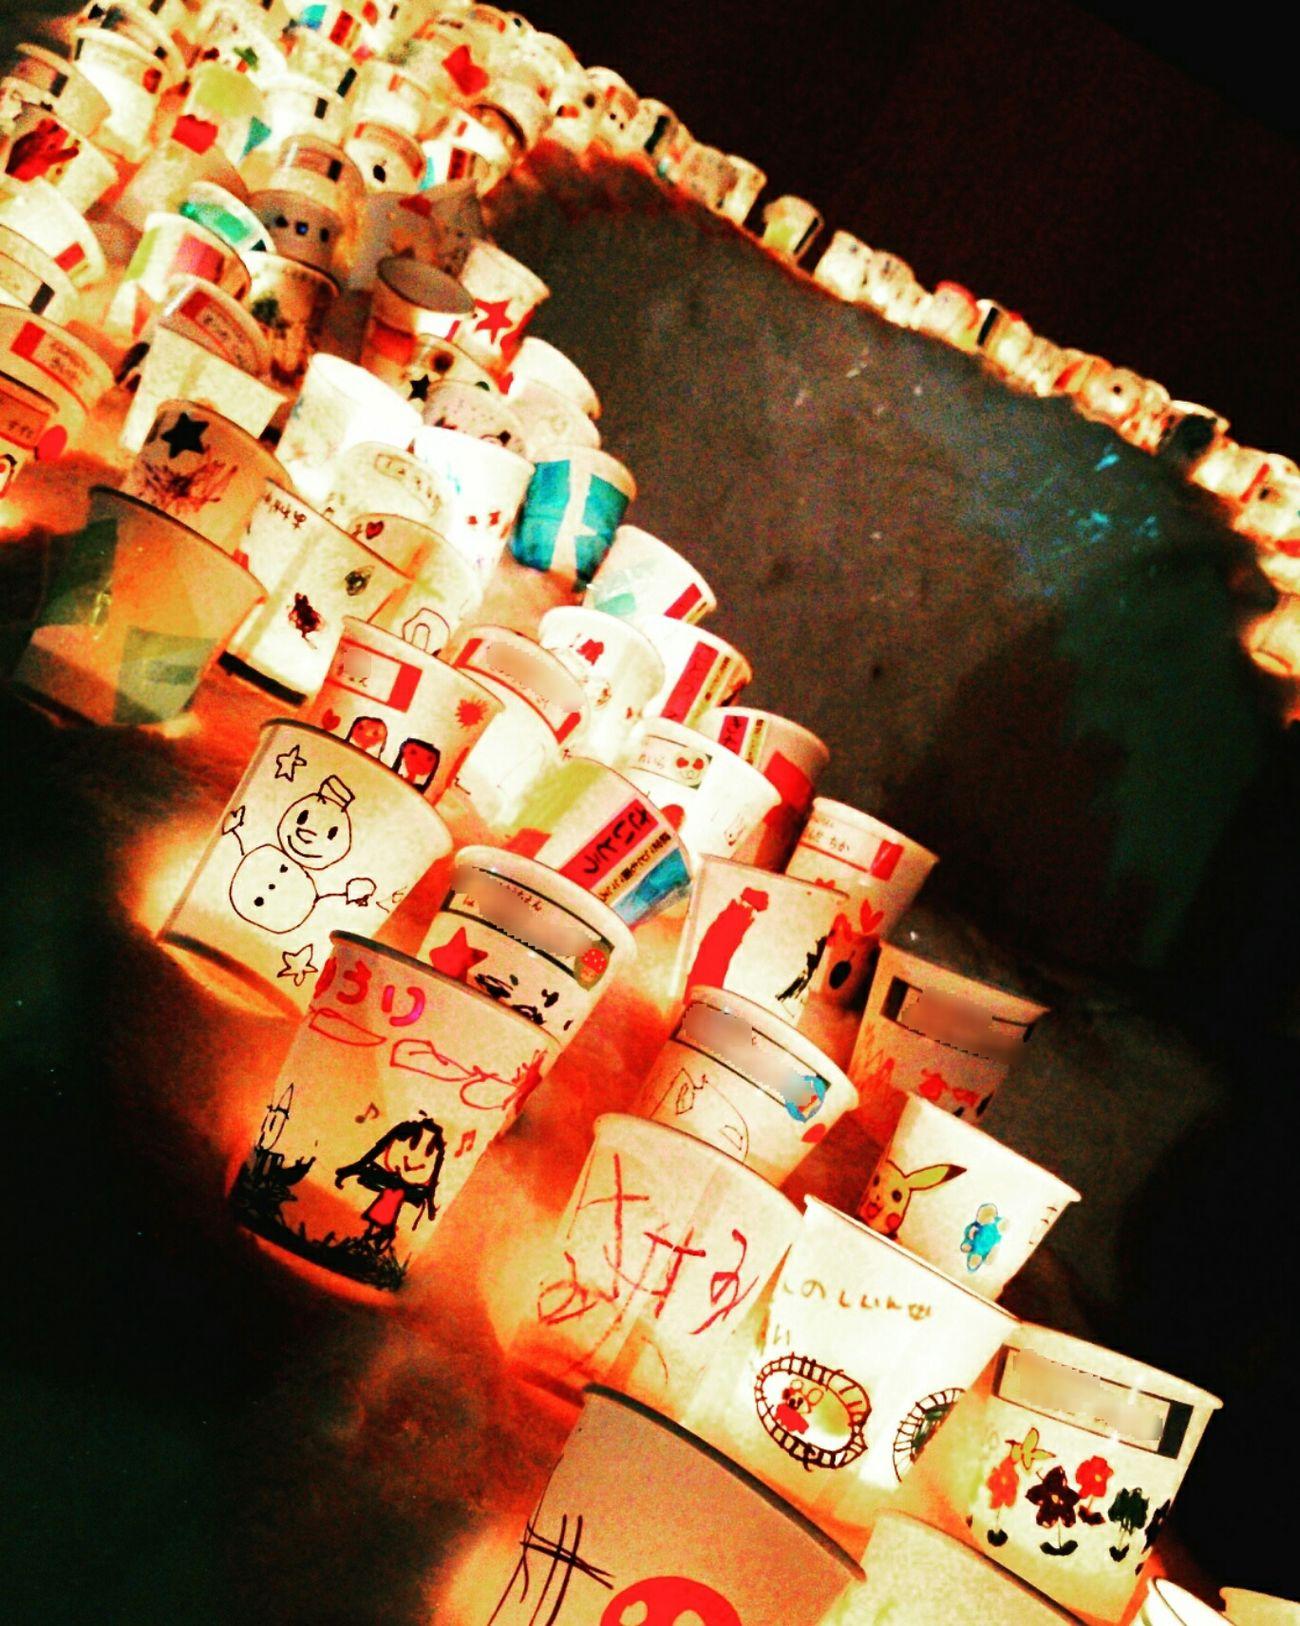 Winter Cool Snow Light Candle Light Cups Fire Children カップキャンドル 幼稚園児 手描き 雪国 ライトアップ